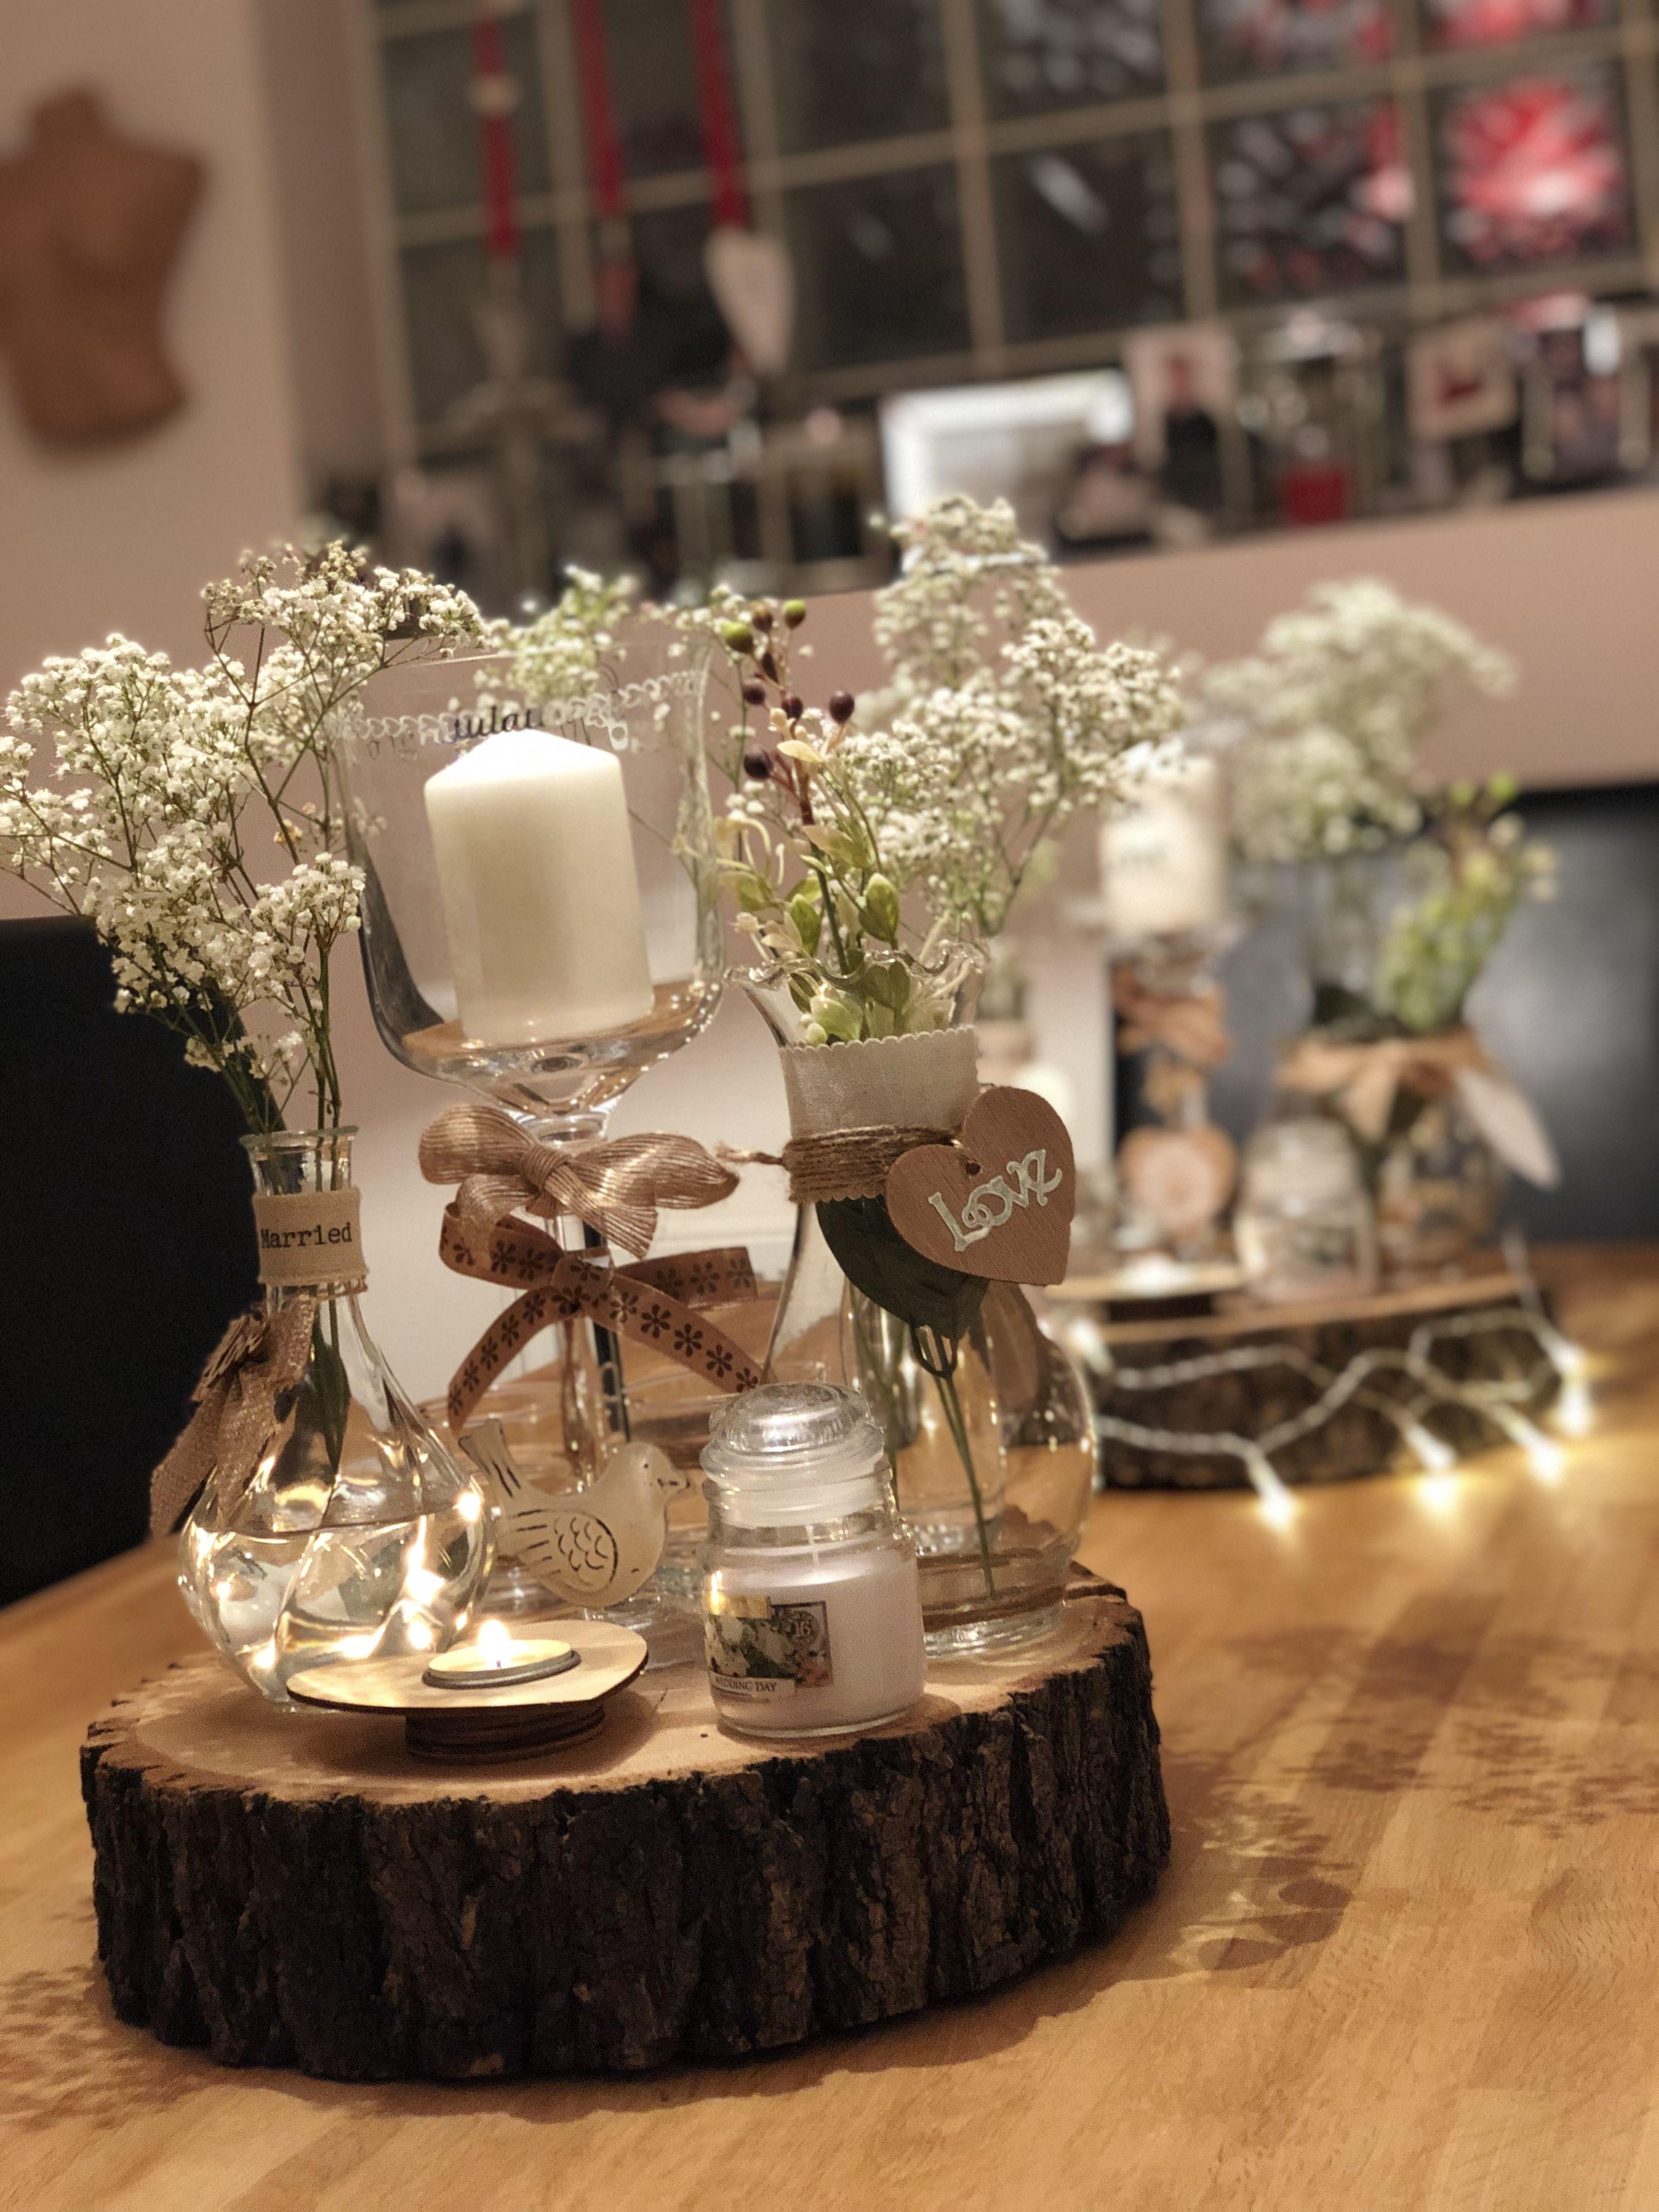 Rustic Wedding Table Centre Ideas Rustic Wedding Table Wedding Table Centres Wedding Table Centerpieces